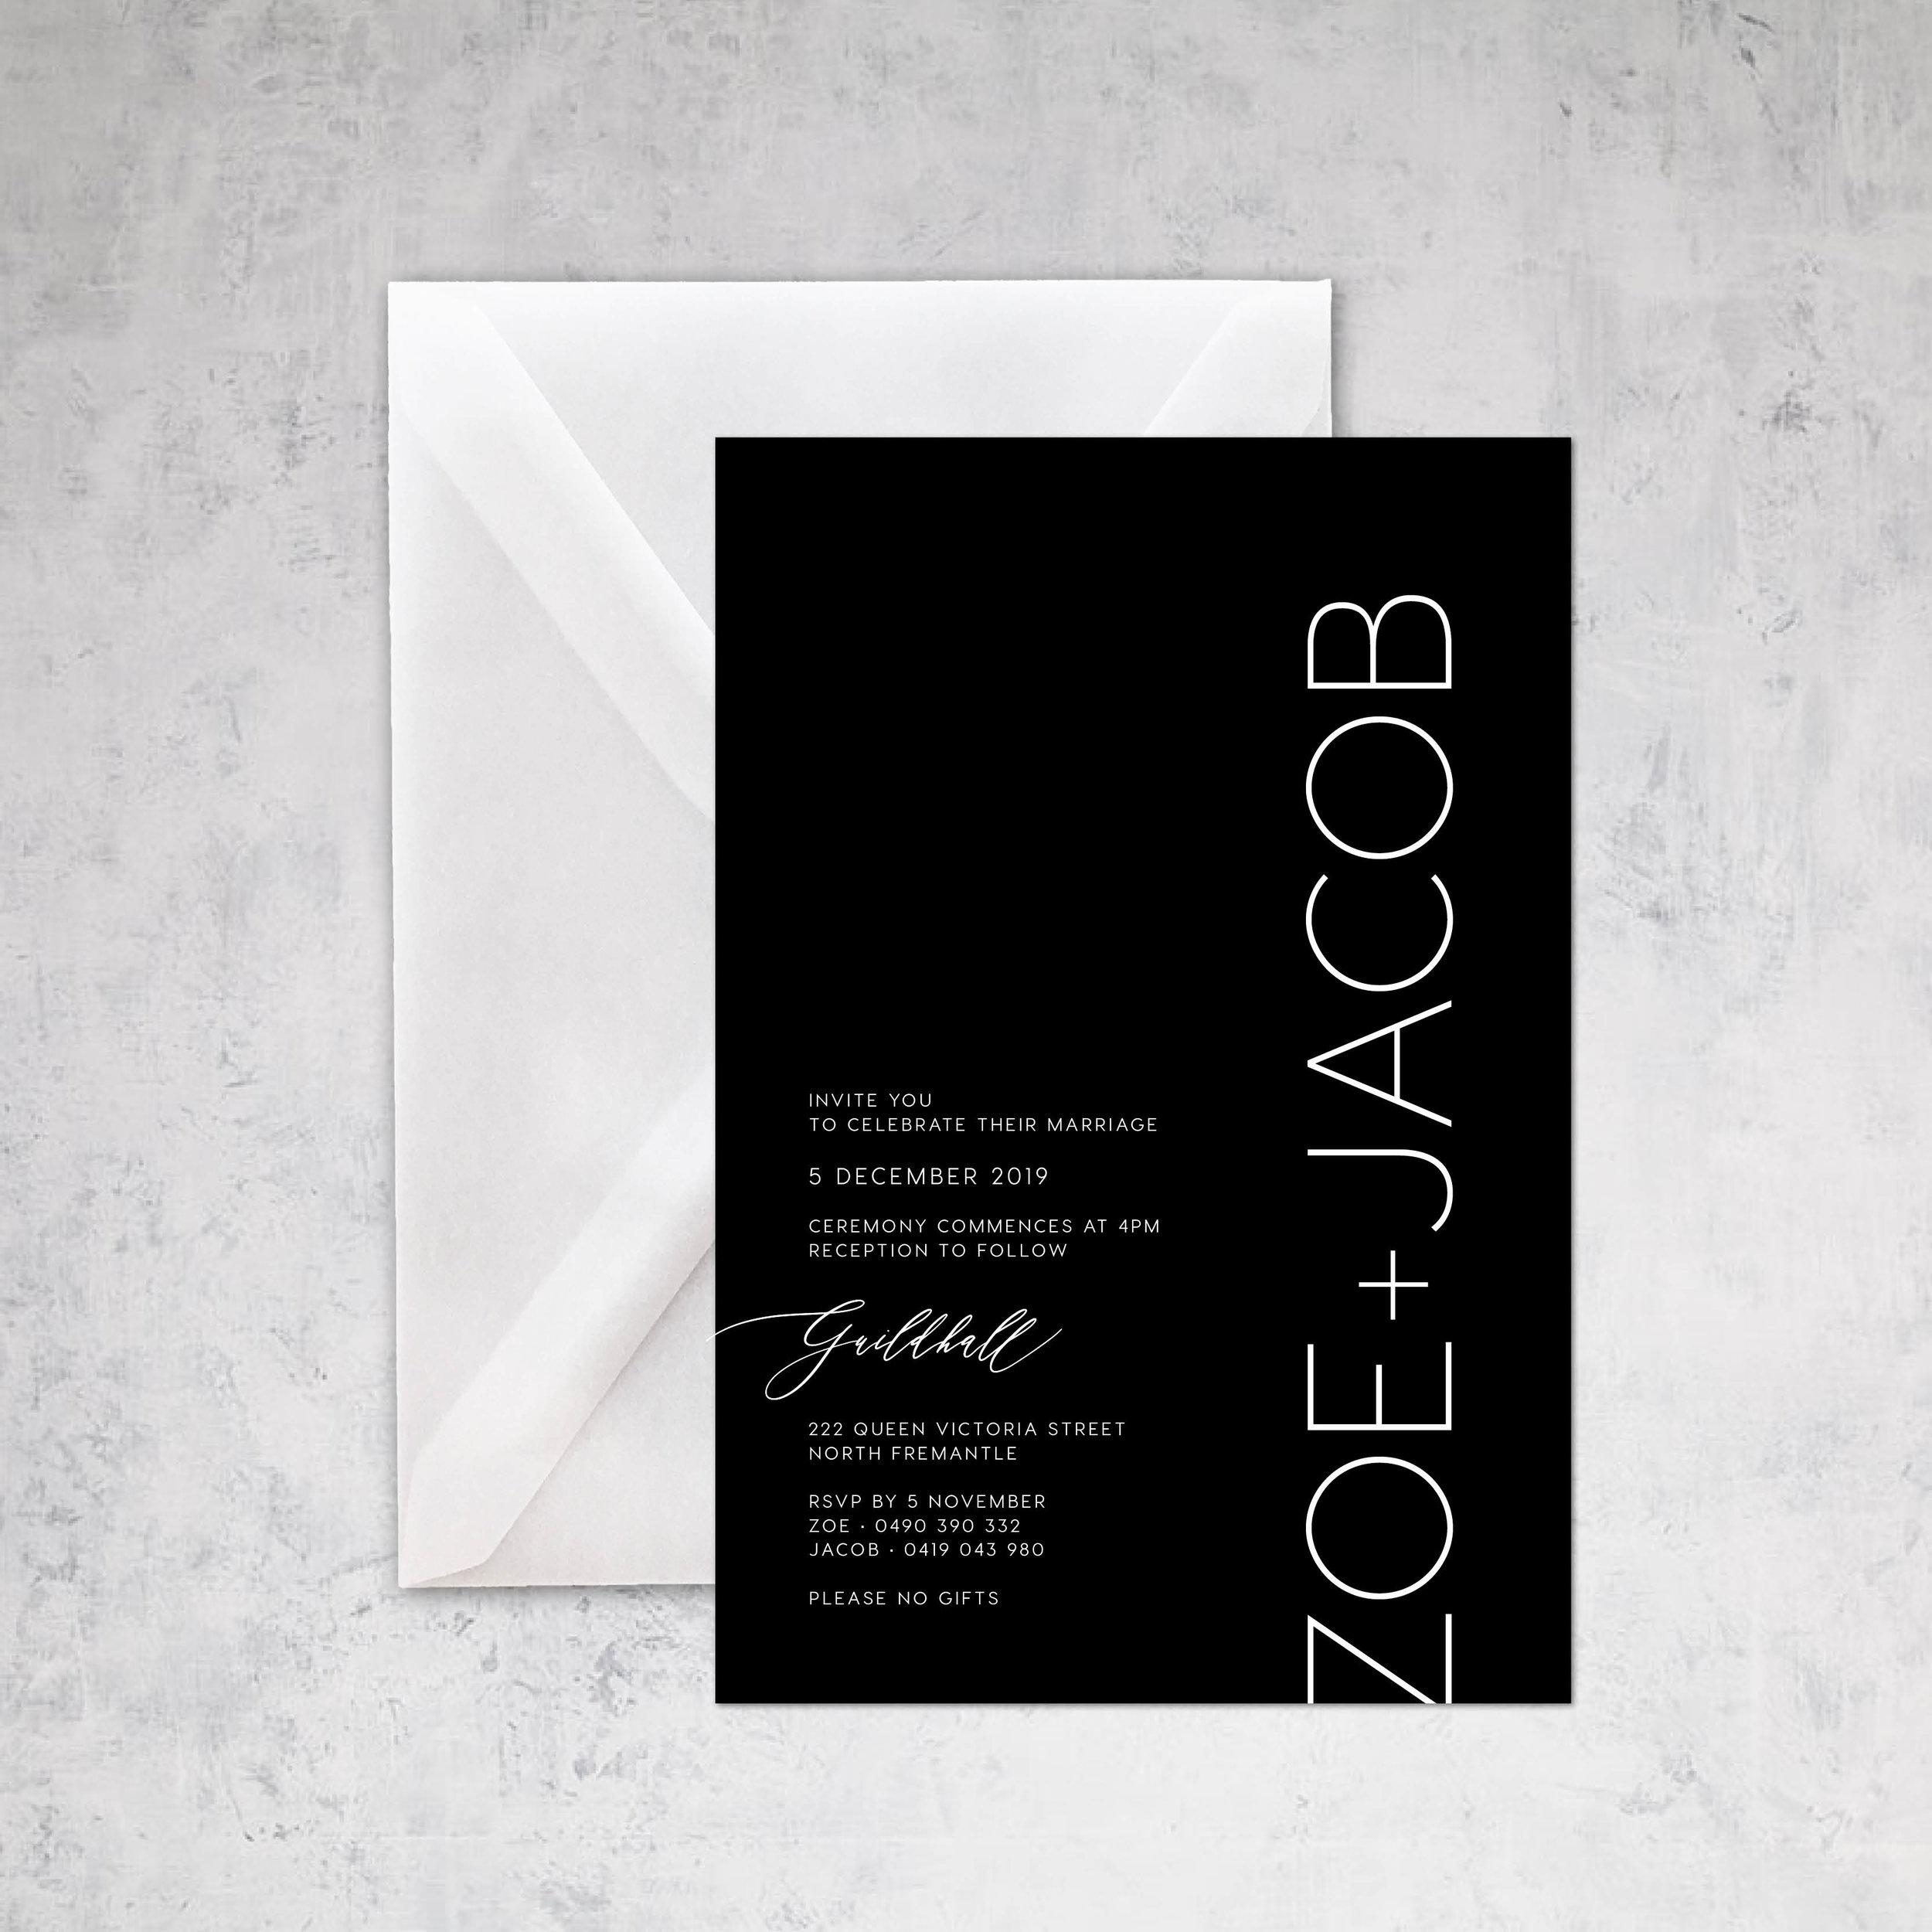 Invitation design Zoe + Jacob